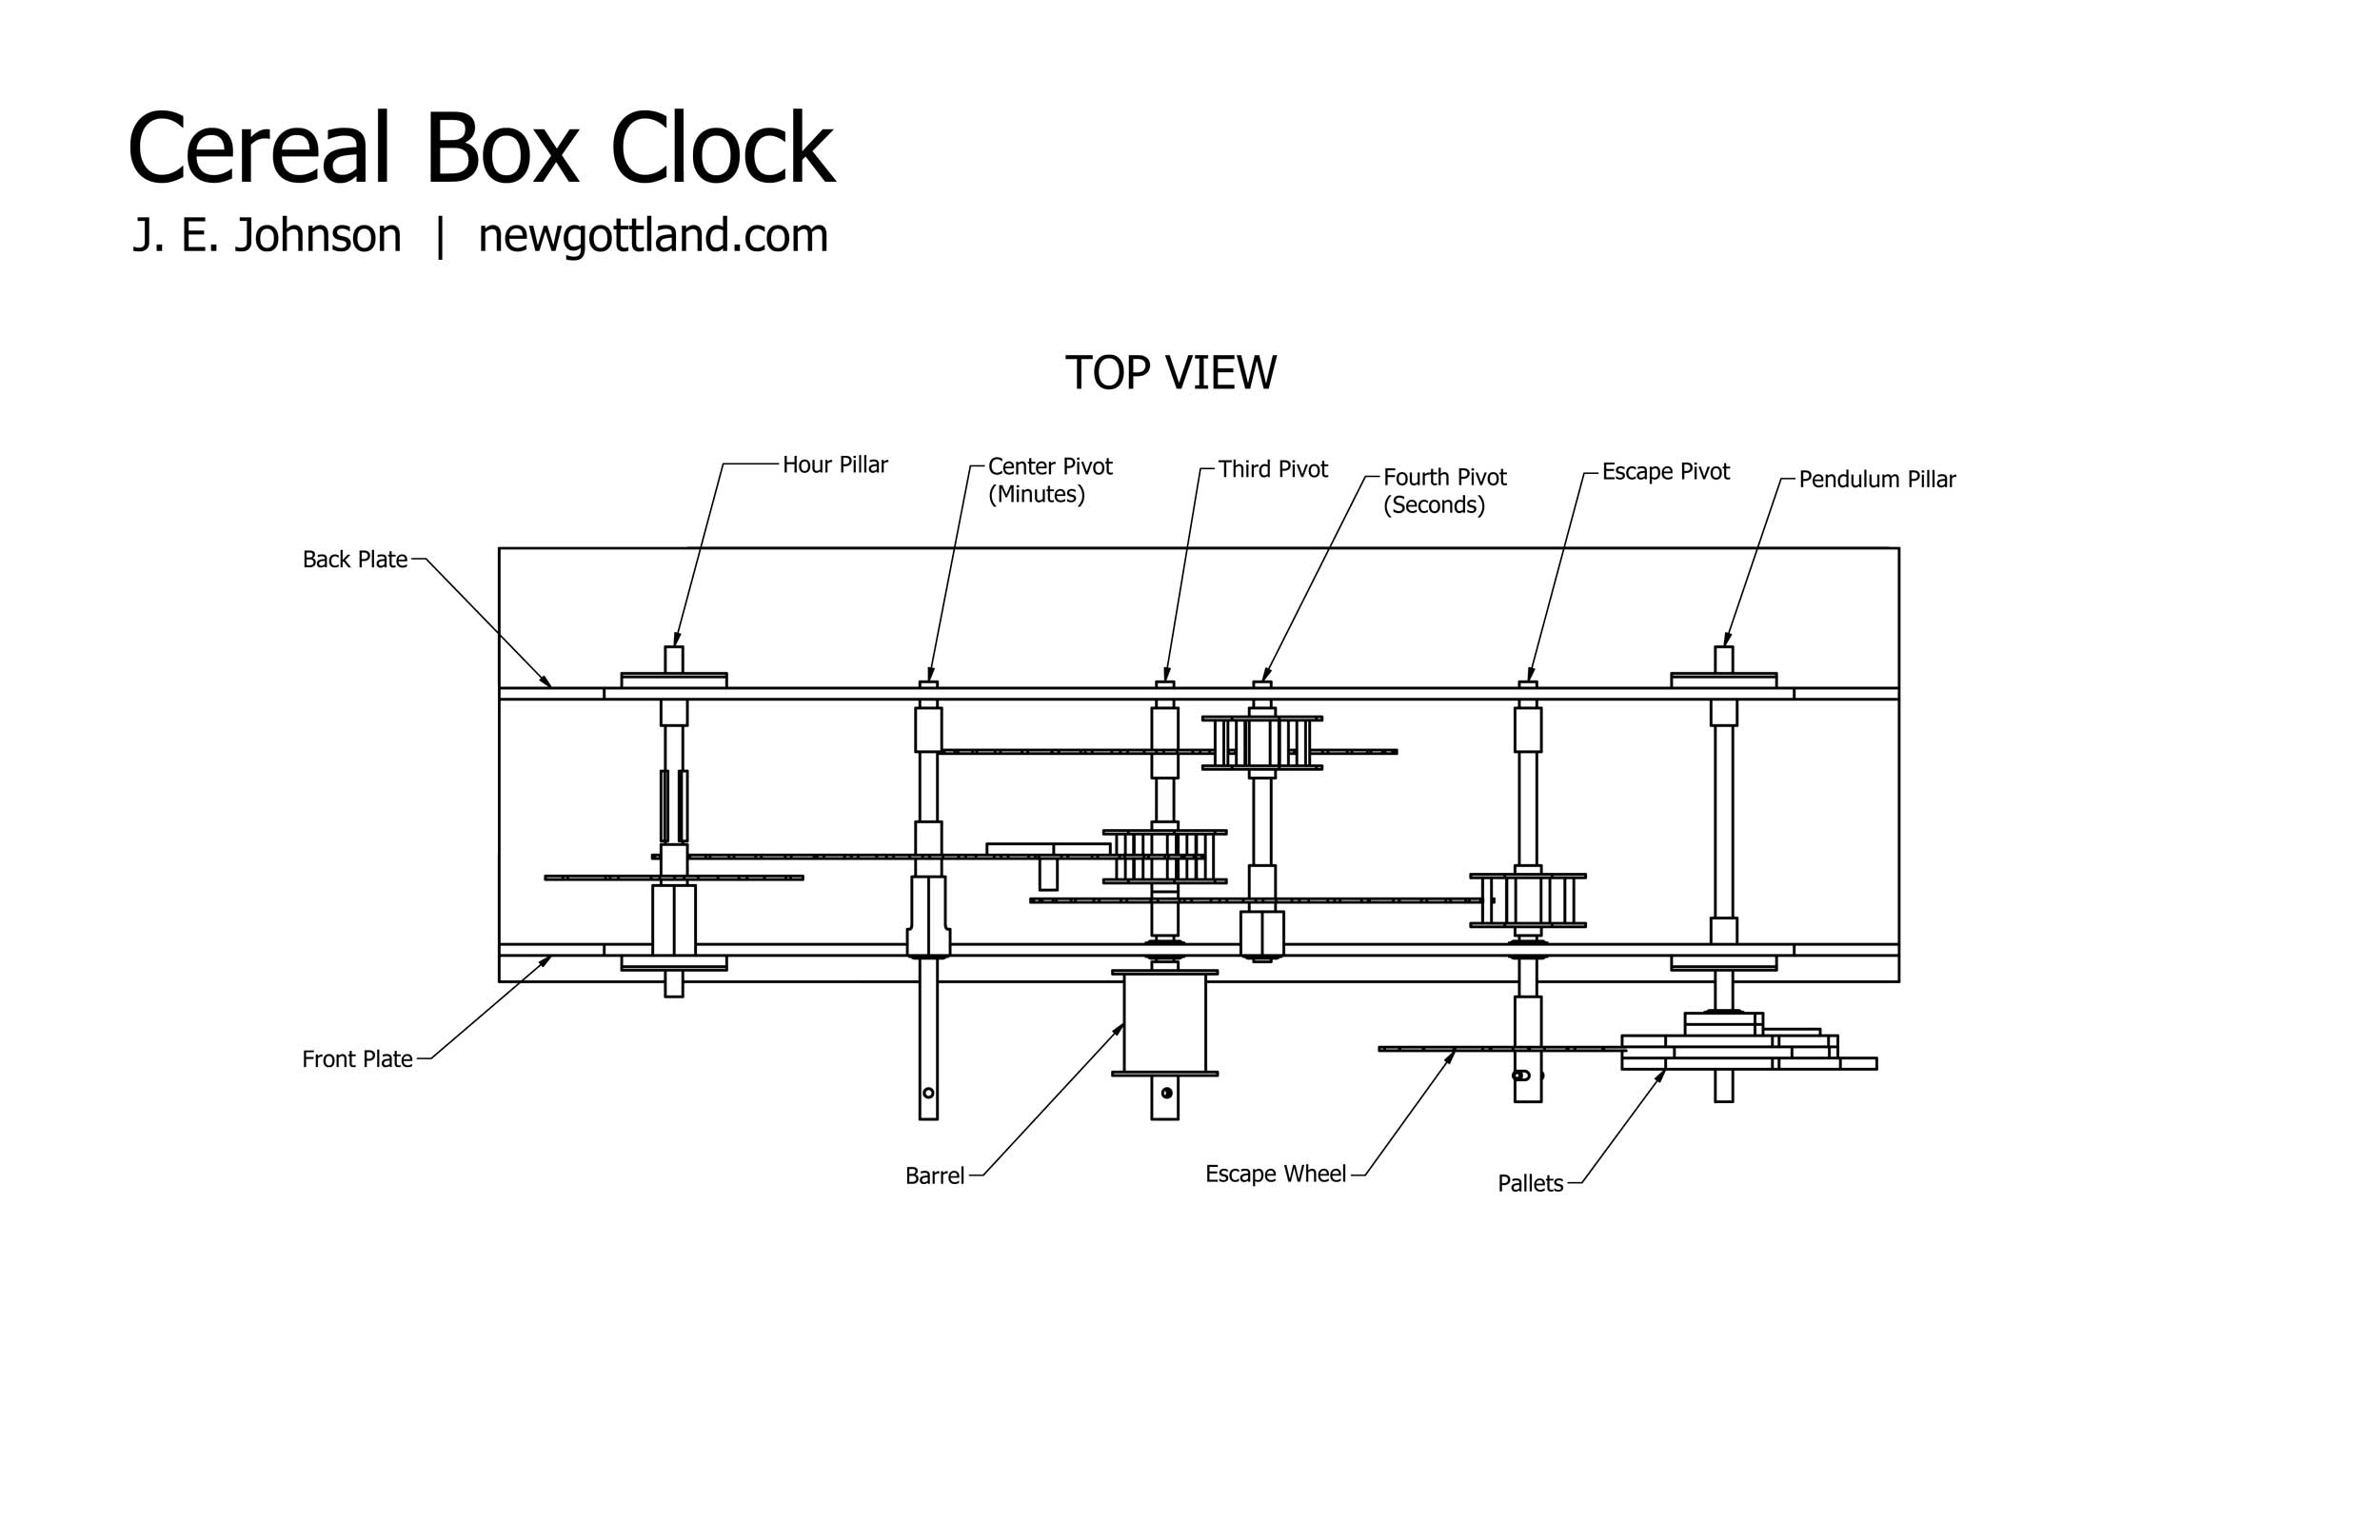 Cereal Box Clock | New Gottland